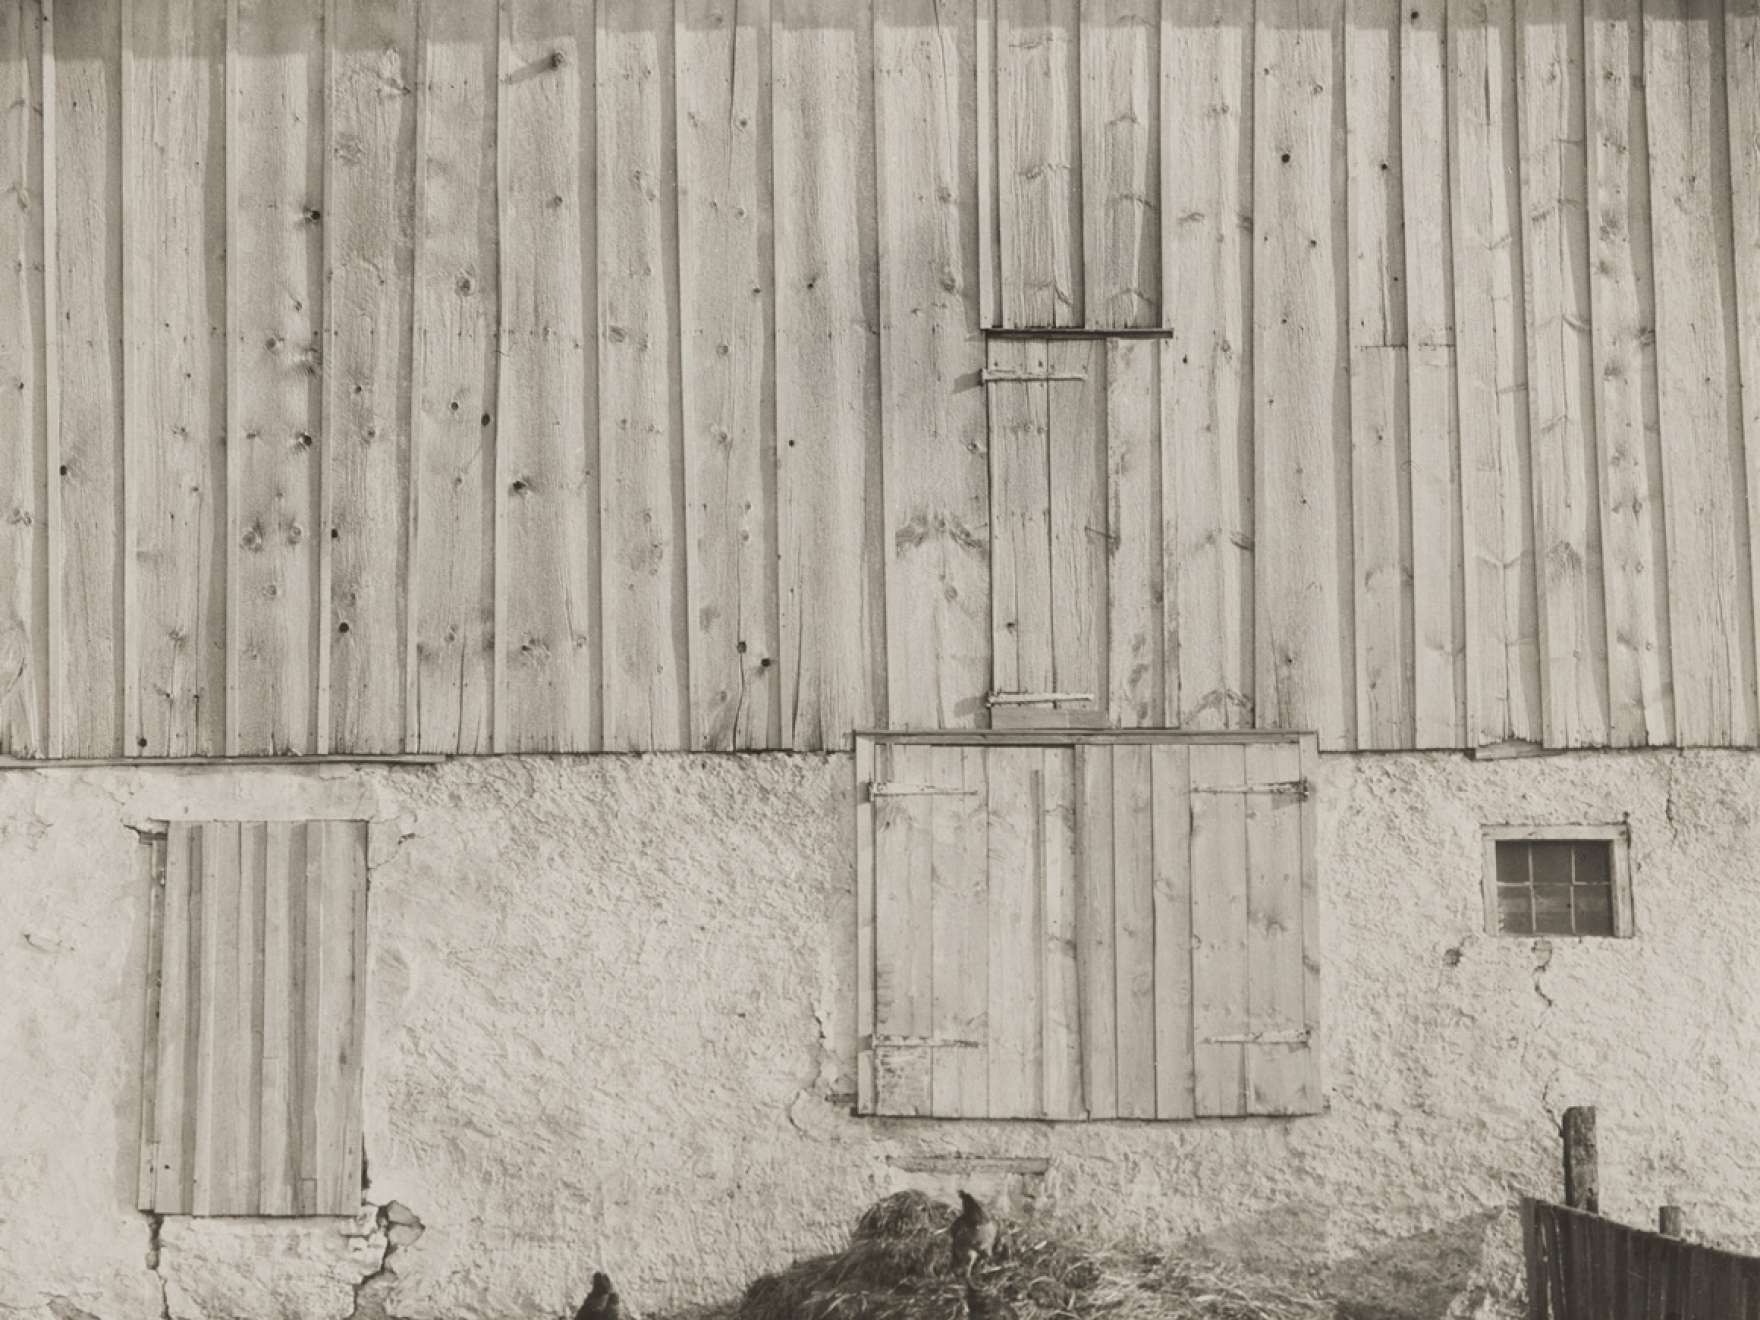 Sheeler's black-and-white photograph titled, Side of White Barn, Bucks County, Pennsylvania